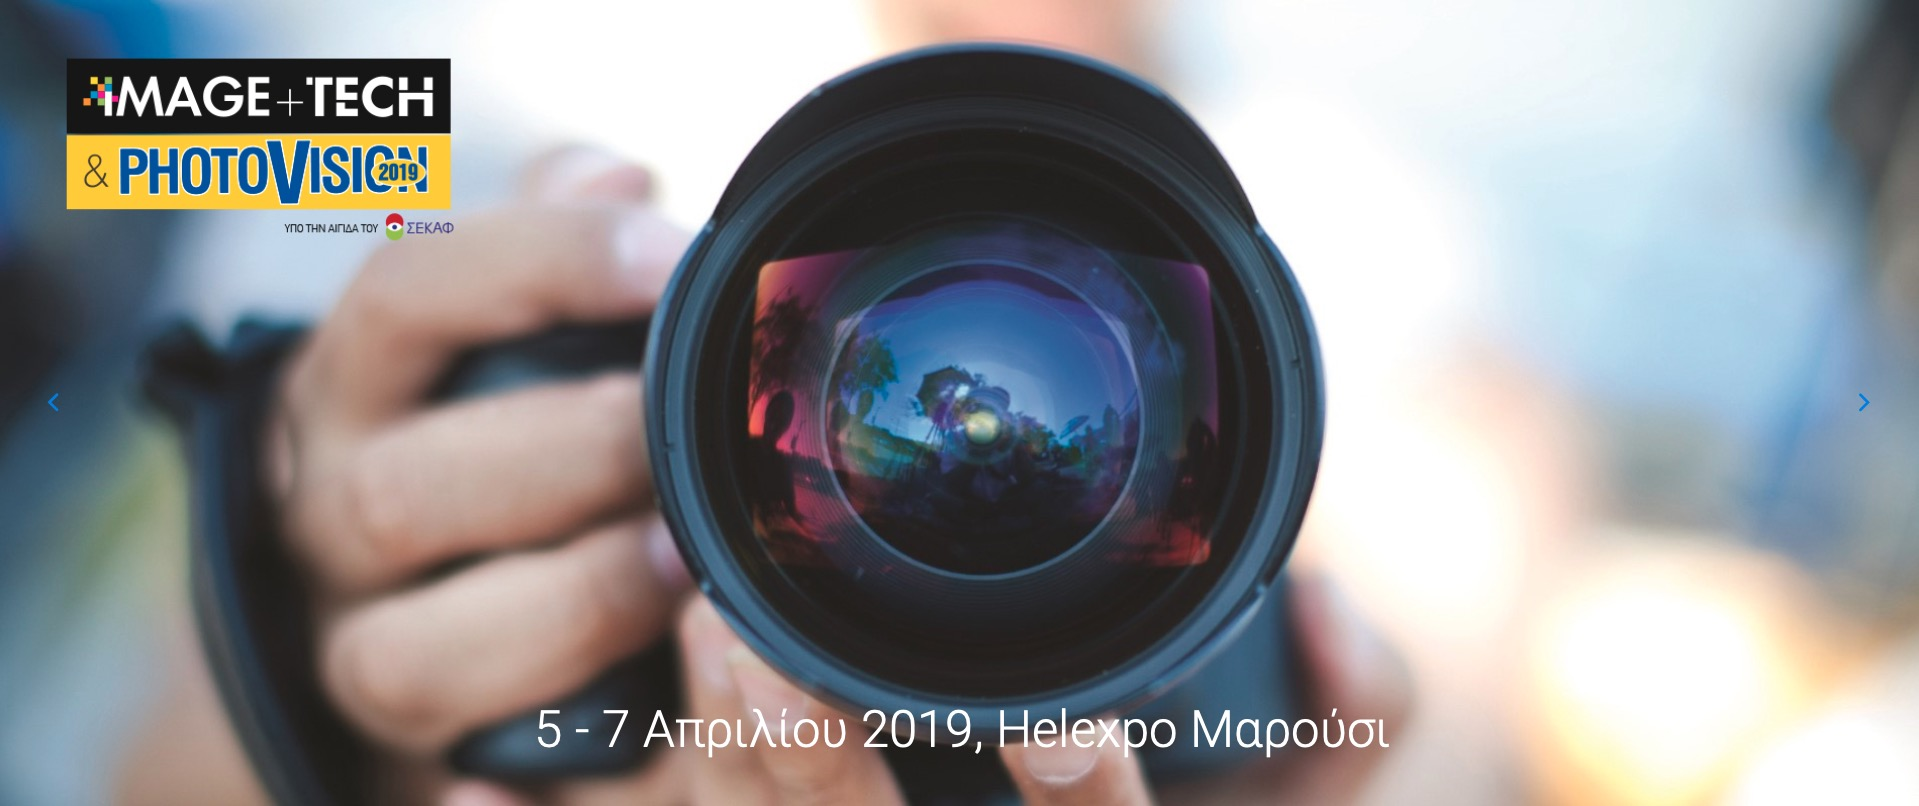 IMAGE +TECH & PHOTOVISION 2019